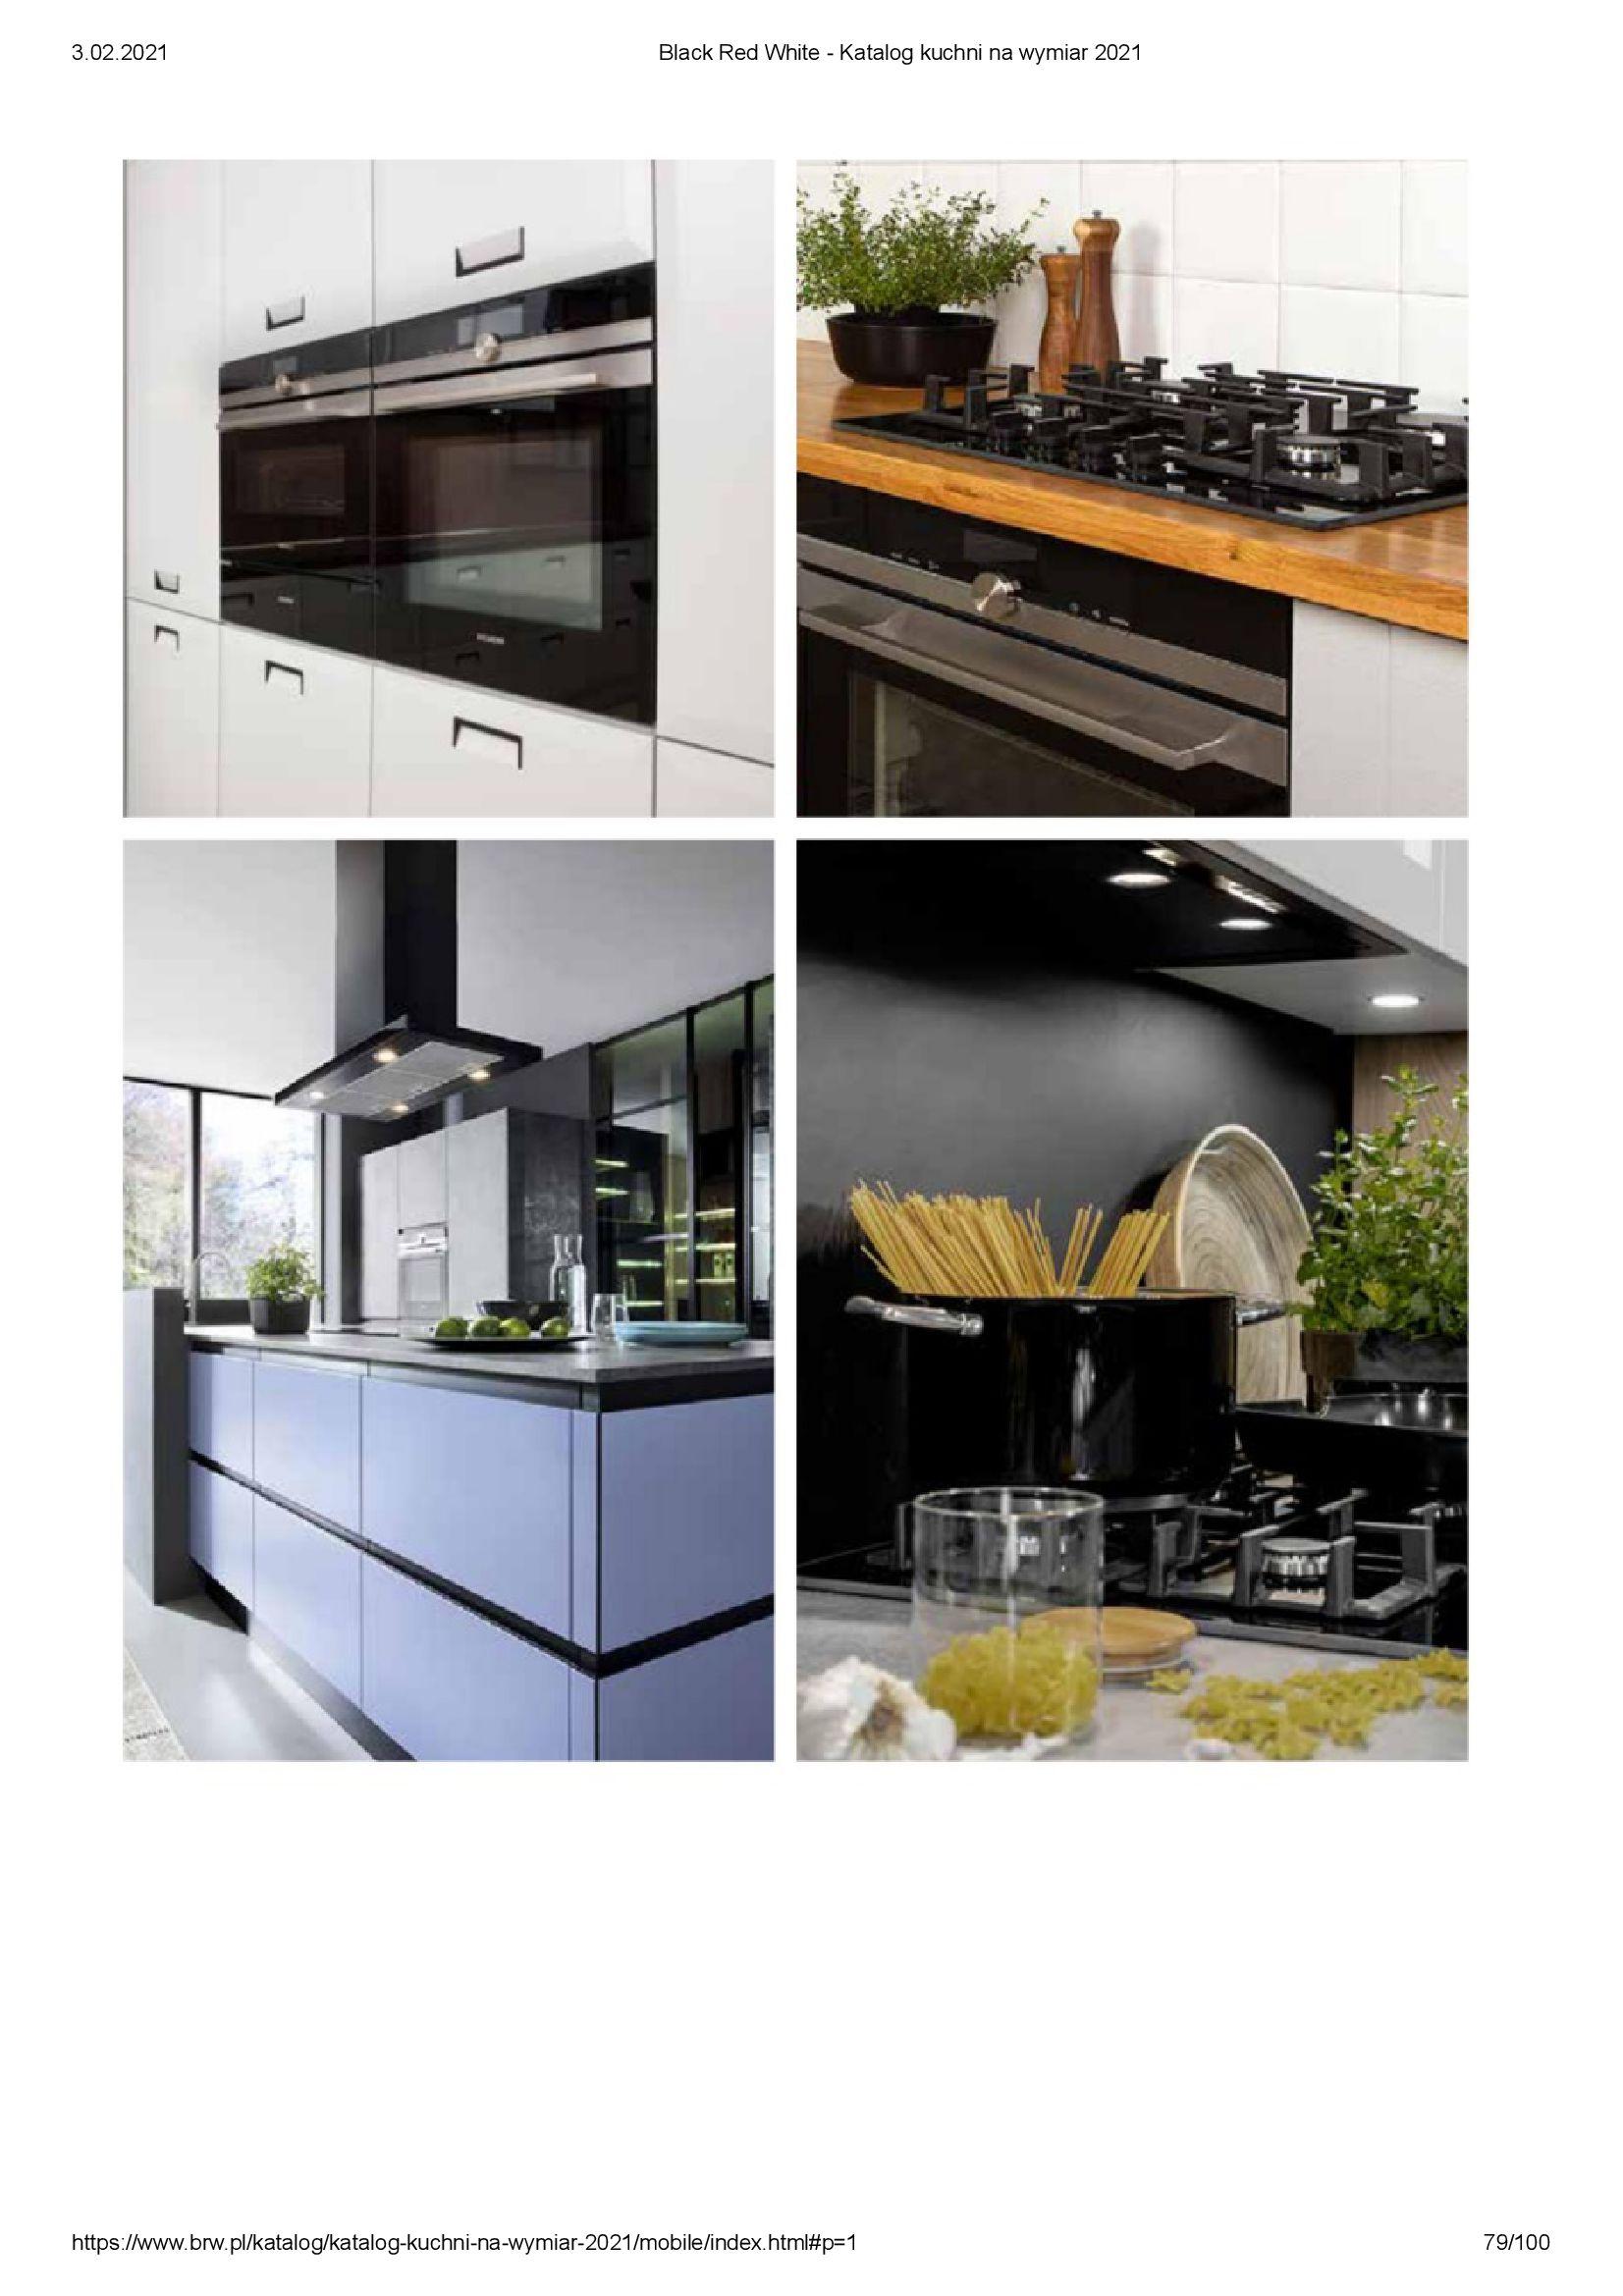 Gazetka Black Red White: Katalog - Kuchnie na wymiar Senso Kitchens 2021 2021-01-01 page-79